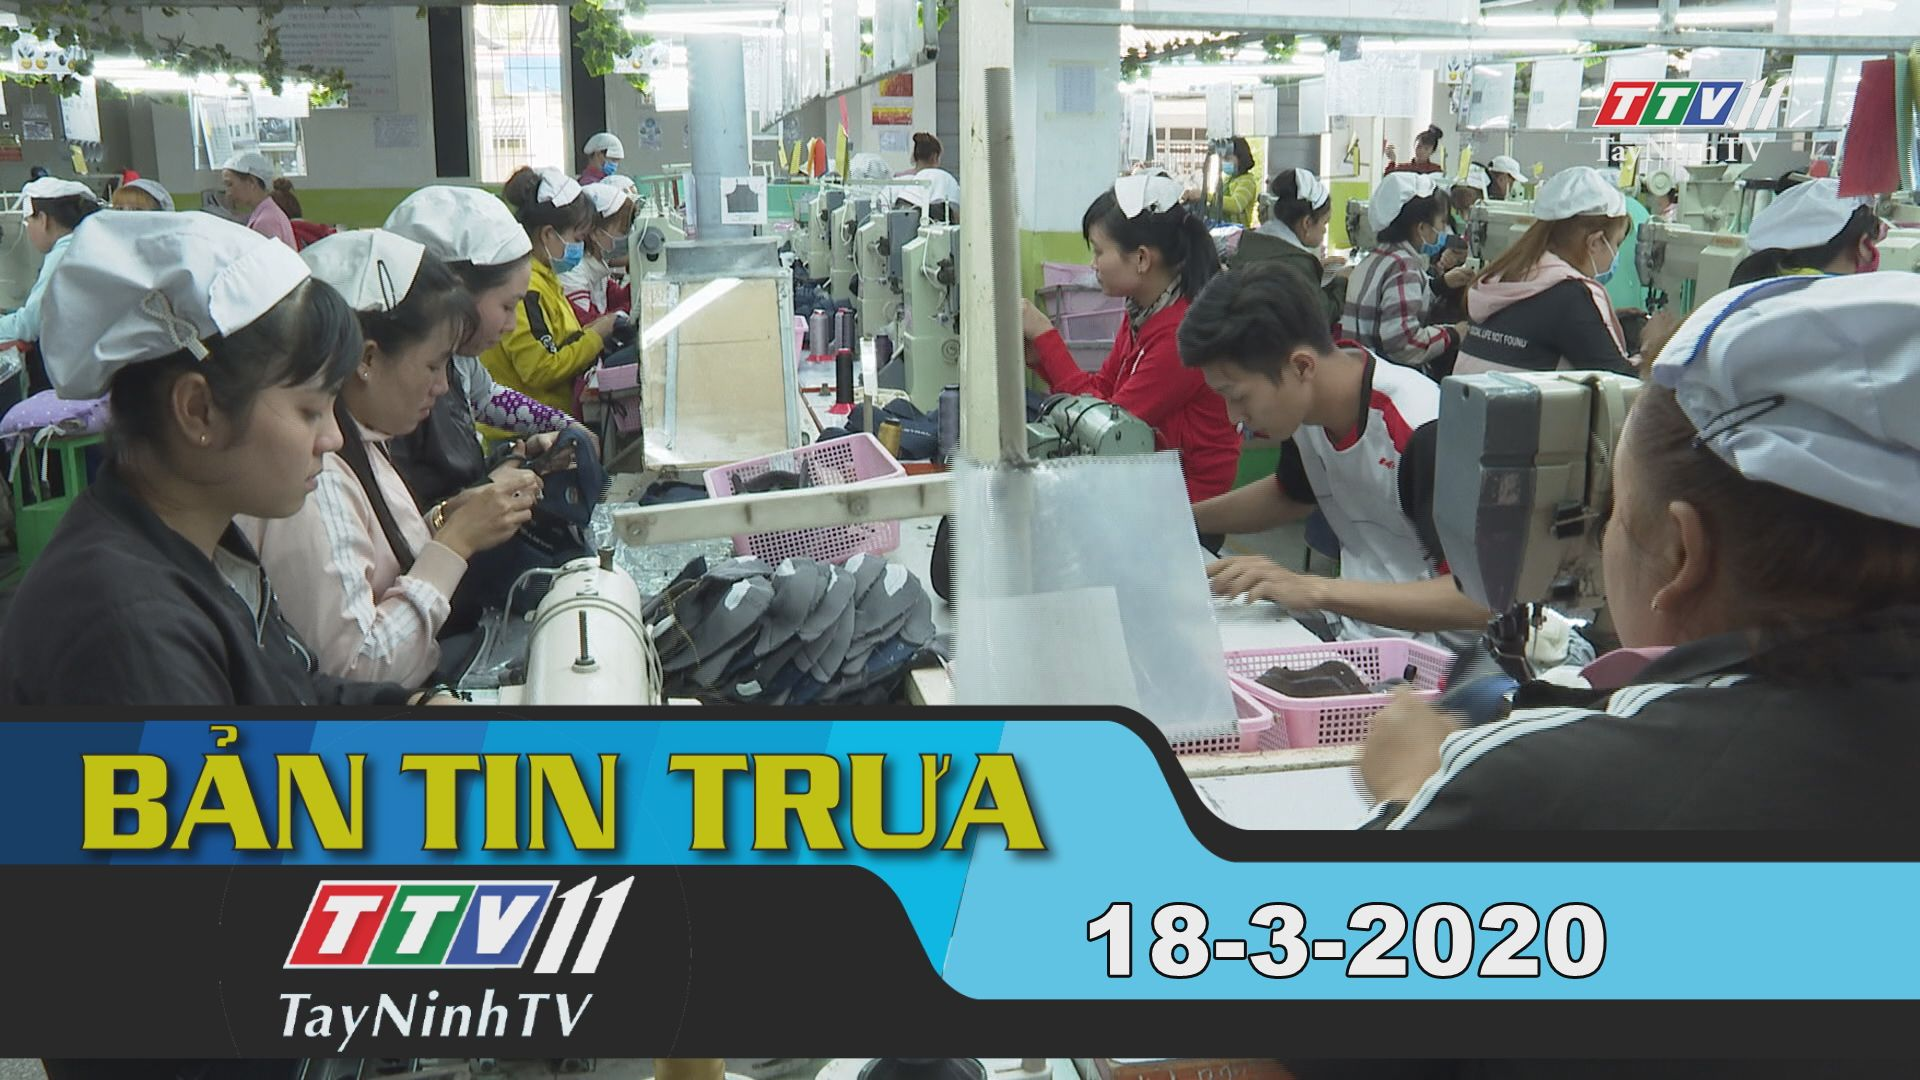 Bản tin trưa 18-3-2020 | Tin tức hôm nay | TayNinhTV